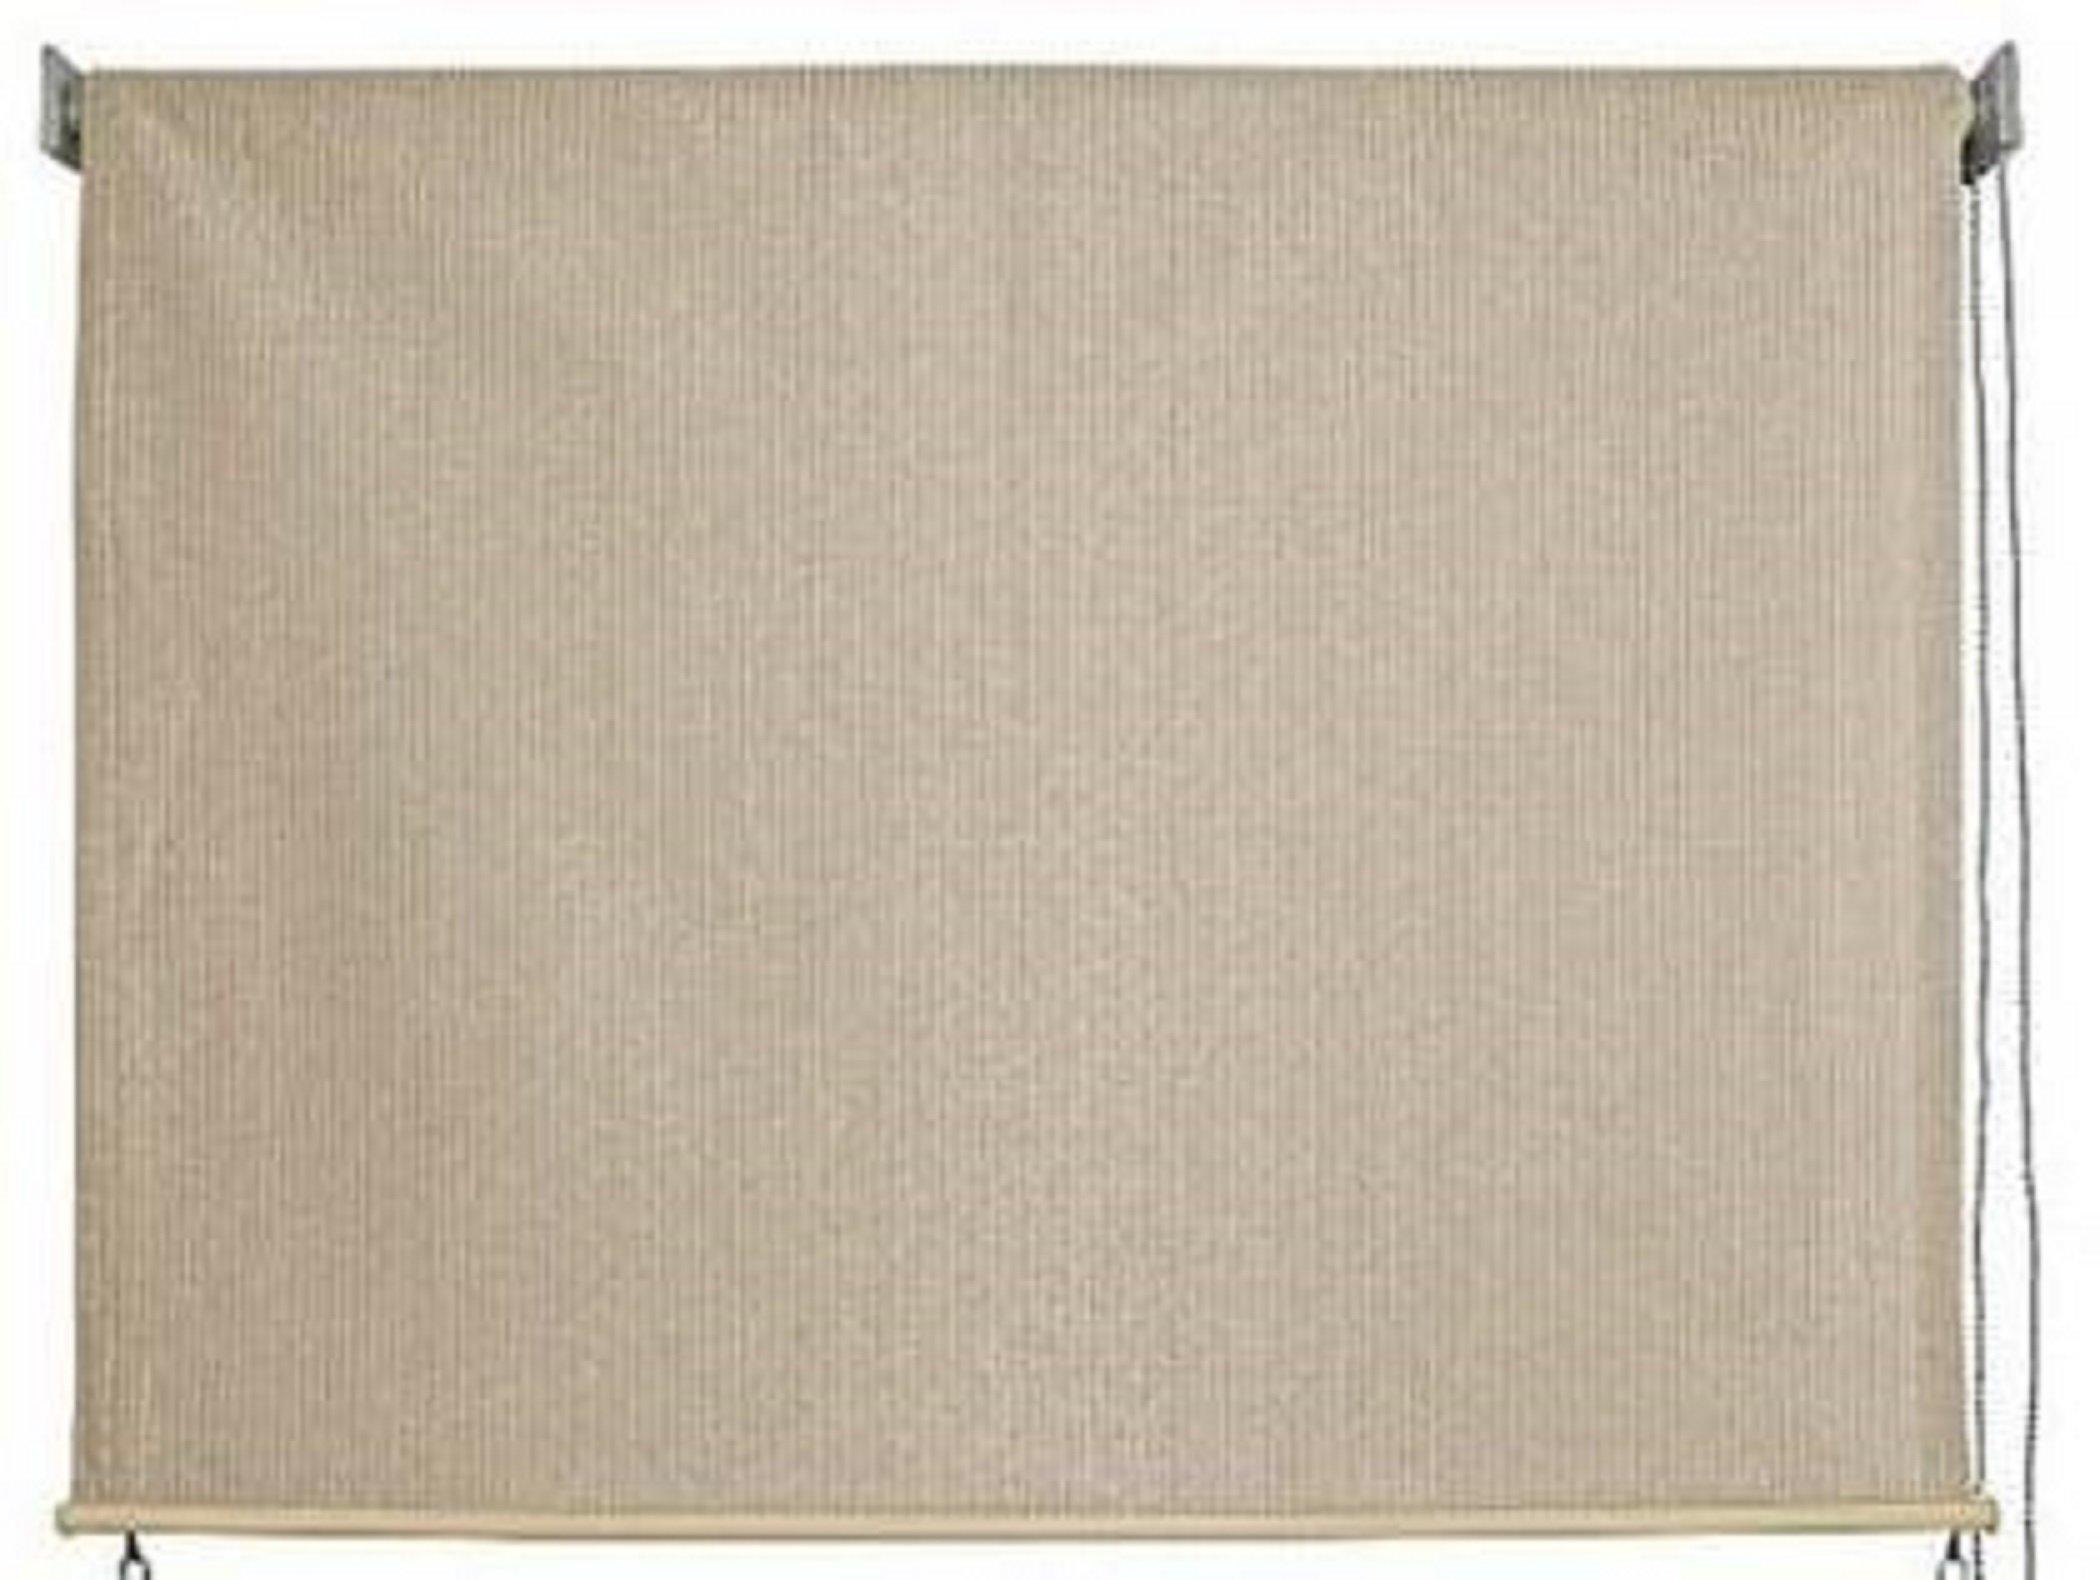 Keystone Fabrics Outdoor Roller Sun Shade, 8-Feet by 6-Feet, Monterey by Keystone Fabrics